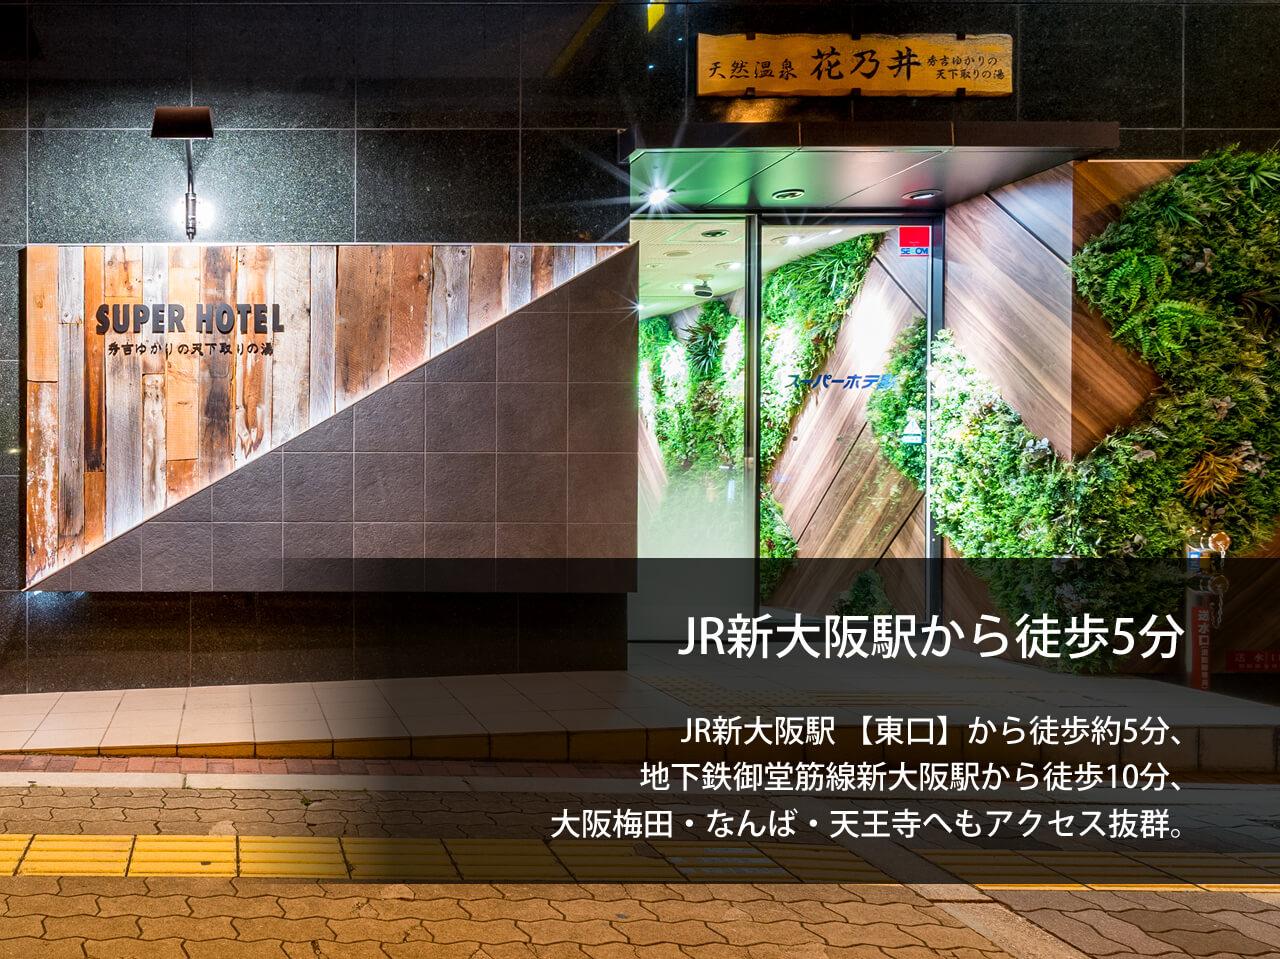 Super Hotel JR신오사카 동구